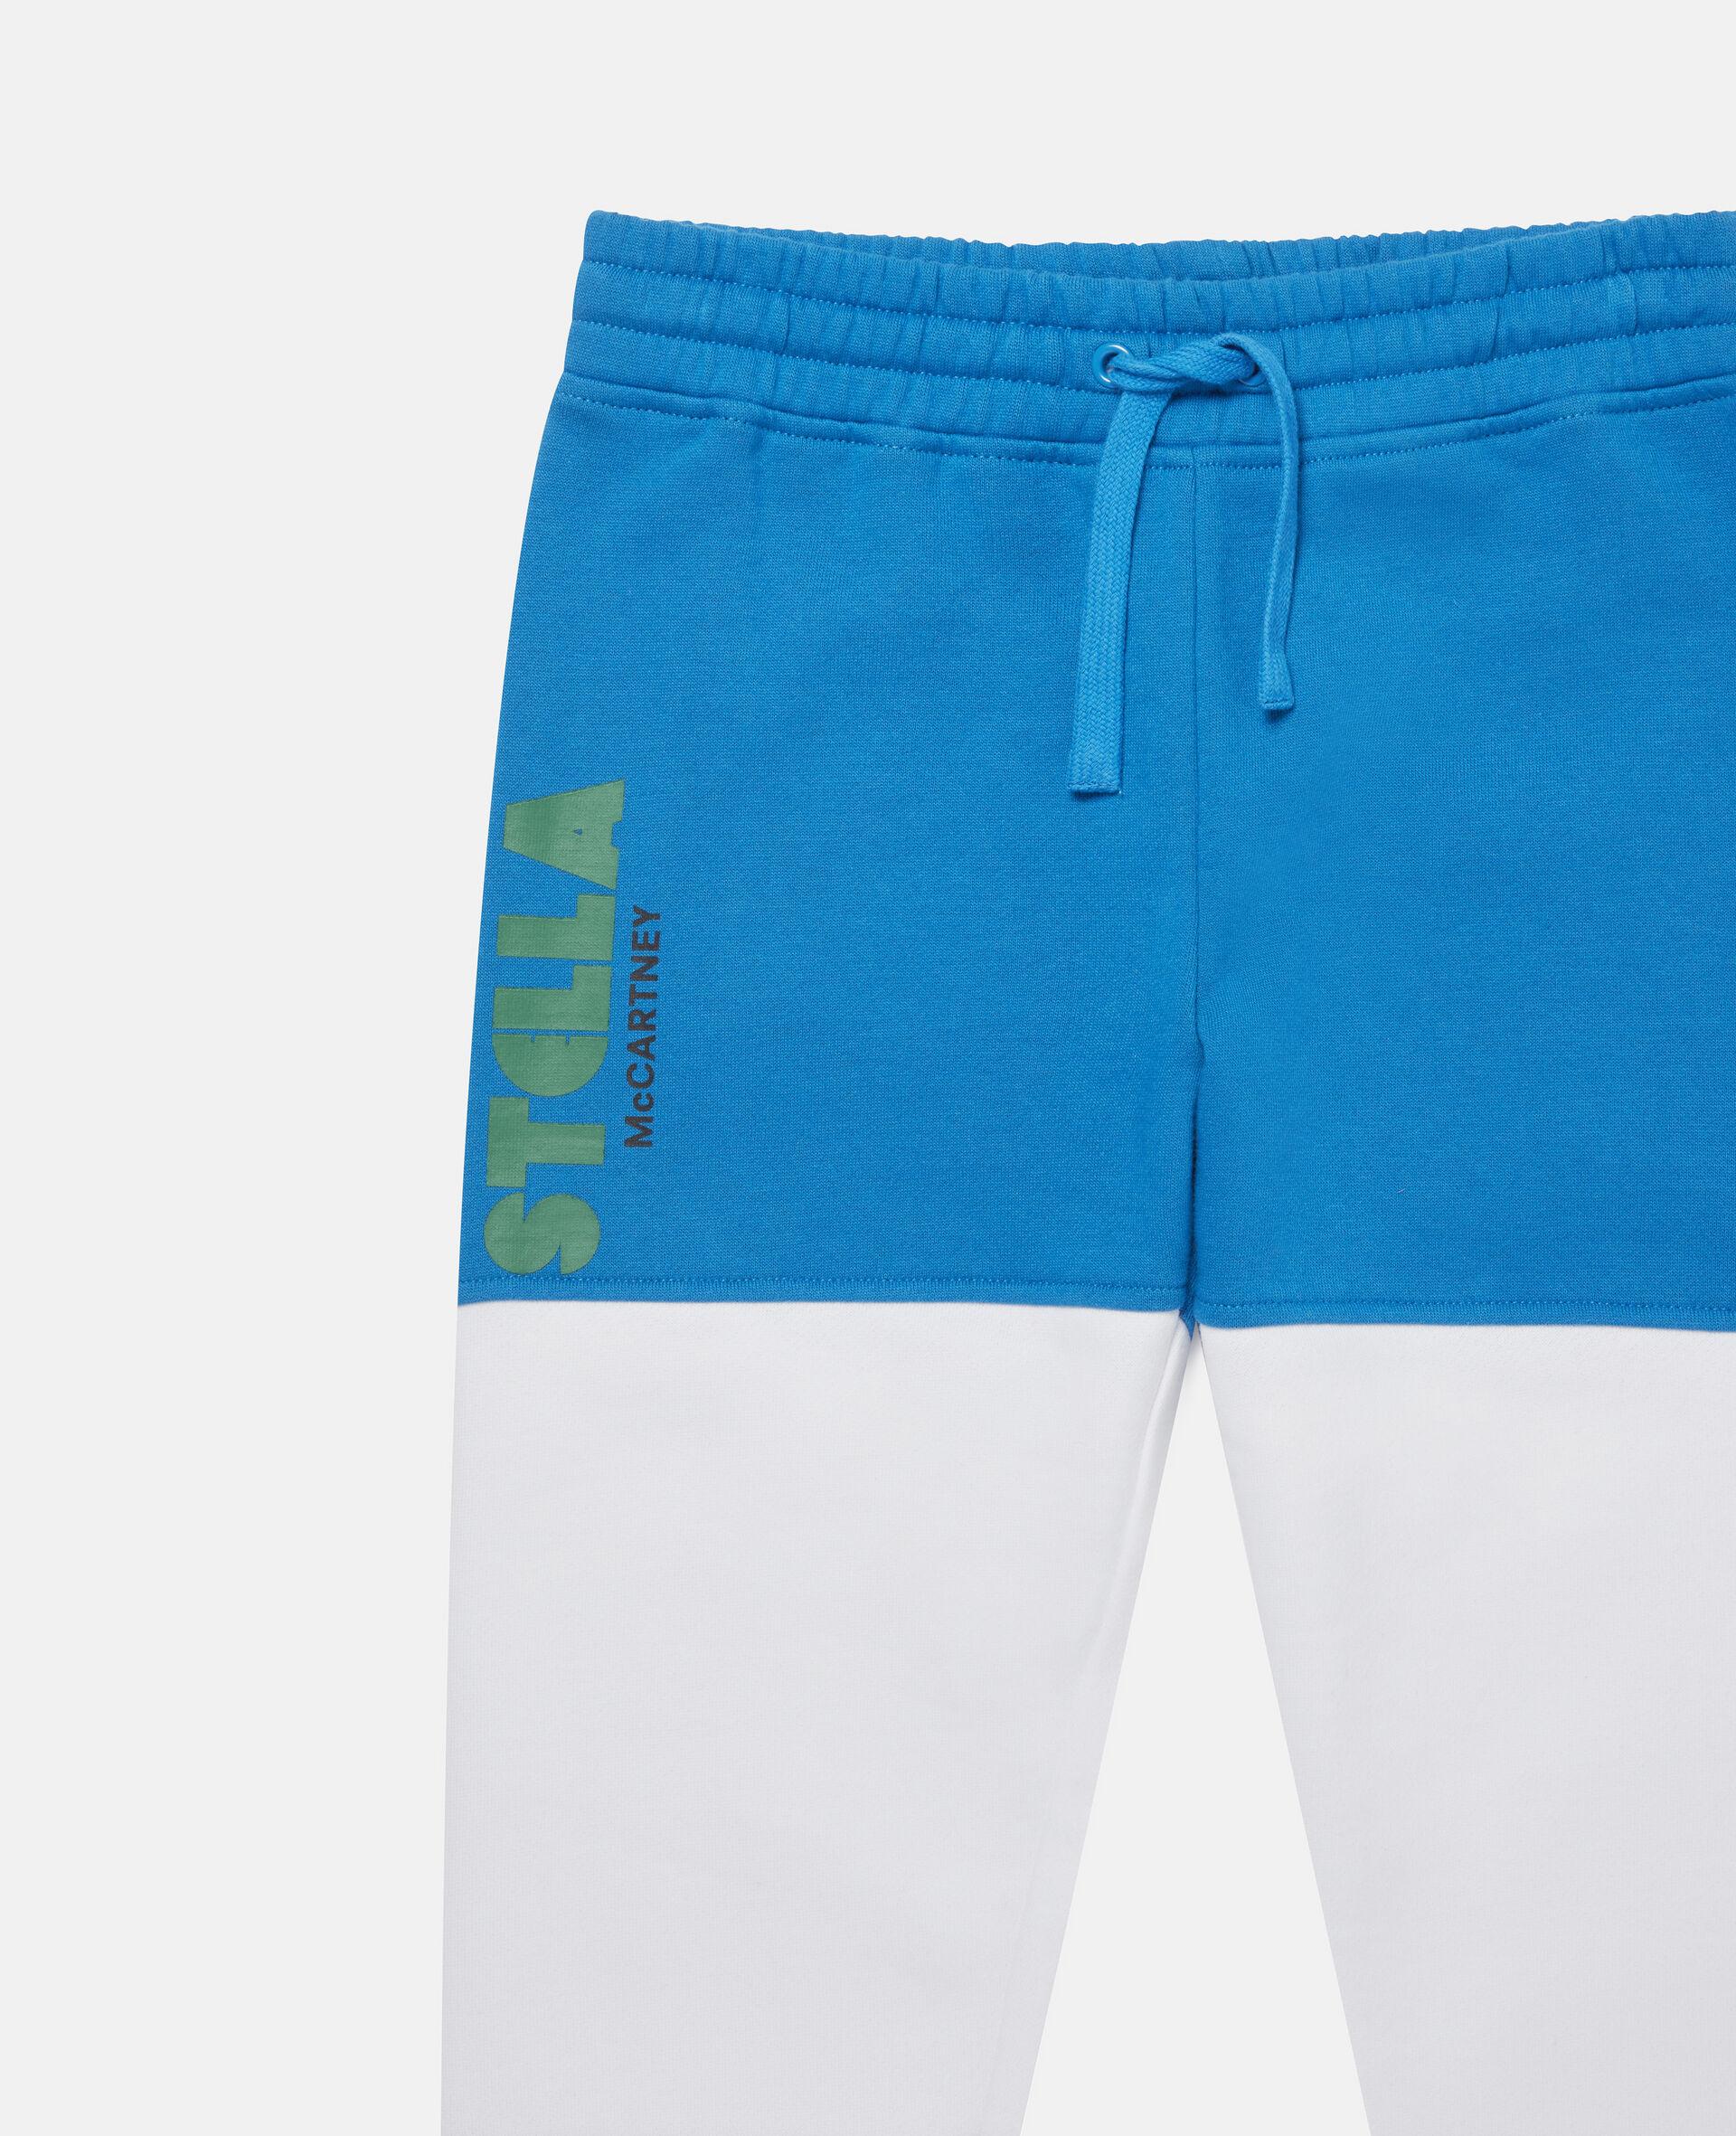 Pantaloni Sportivi a Blocchi di Colore-Fantasia-large image number 1